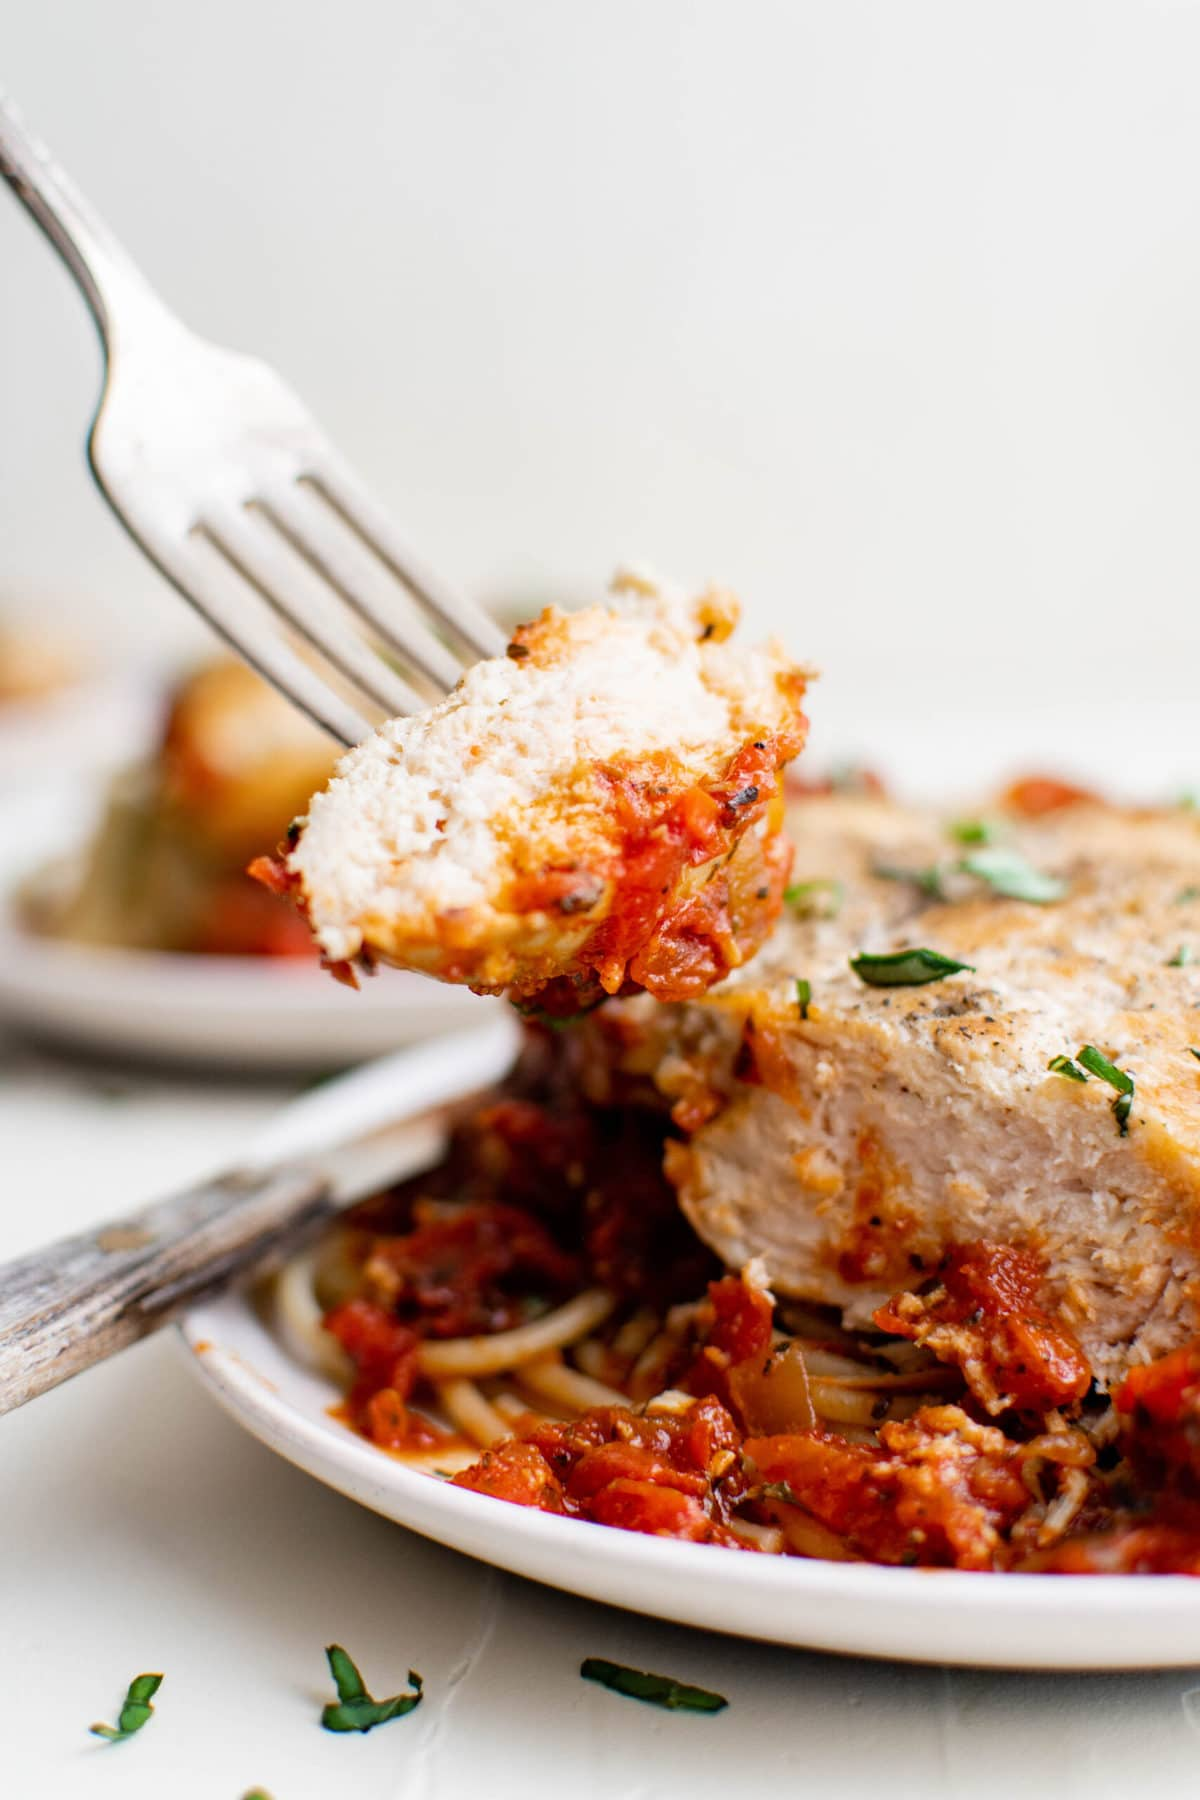 chicken breast, fork, pomodoro sauce, spaghetti, white plates